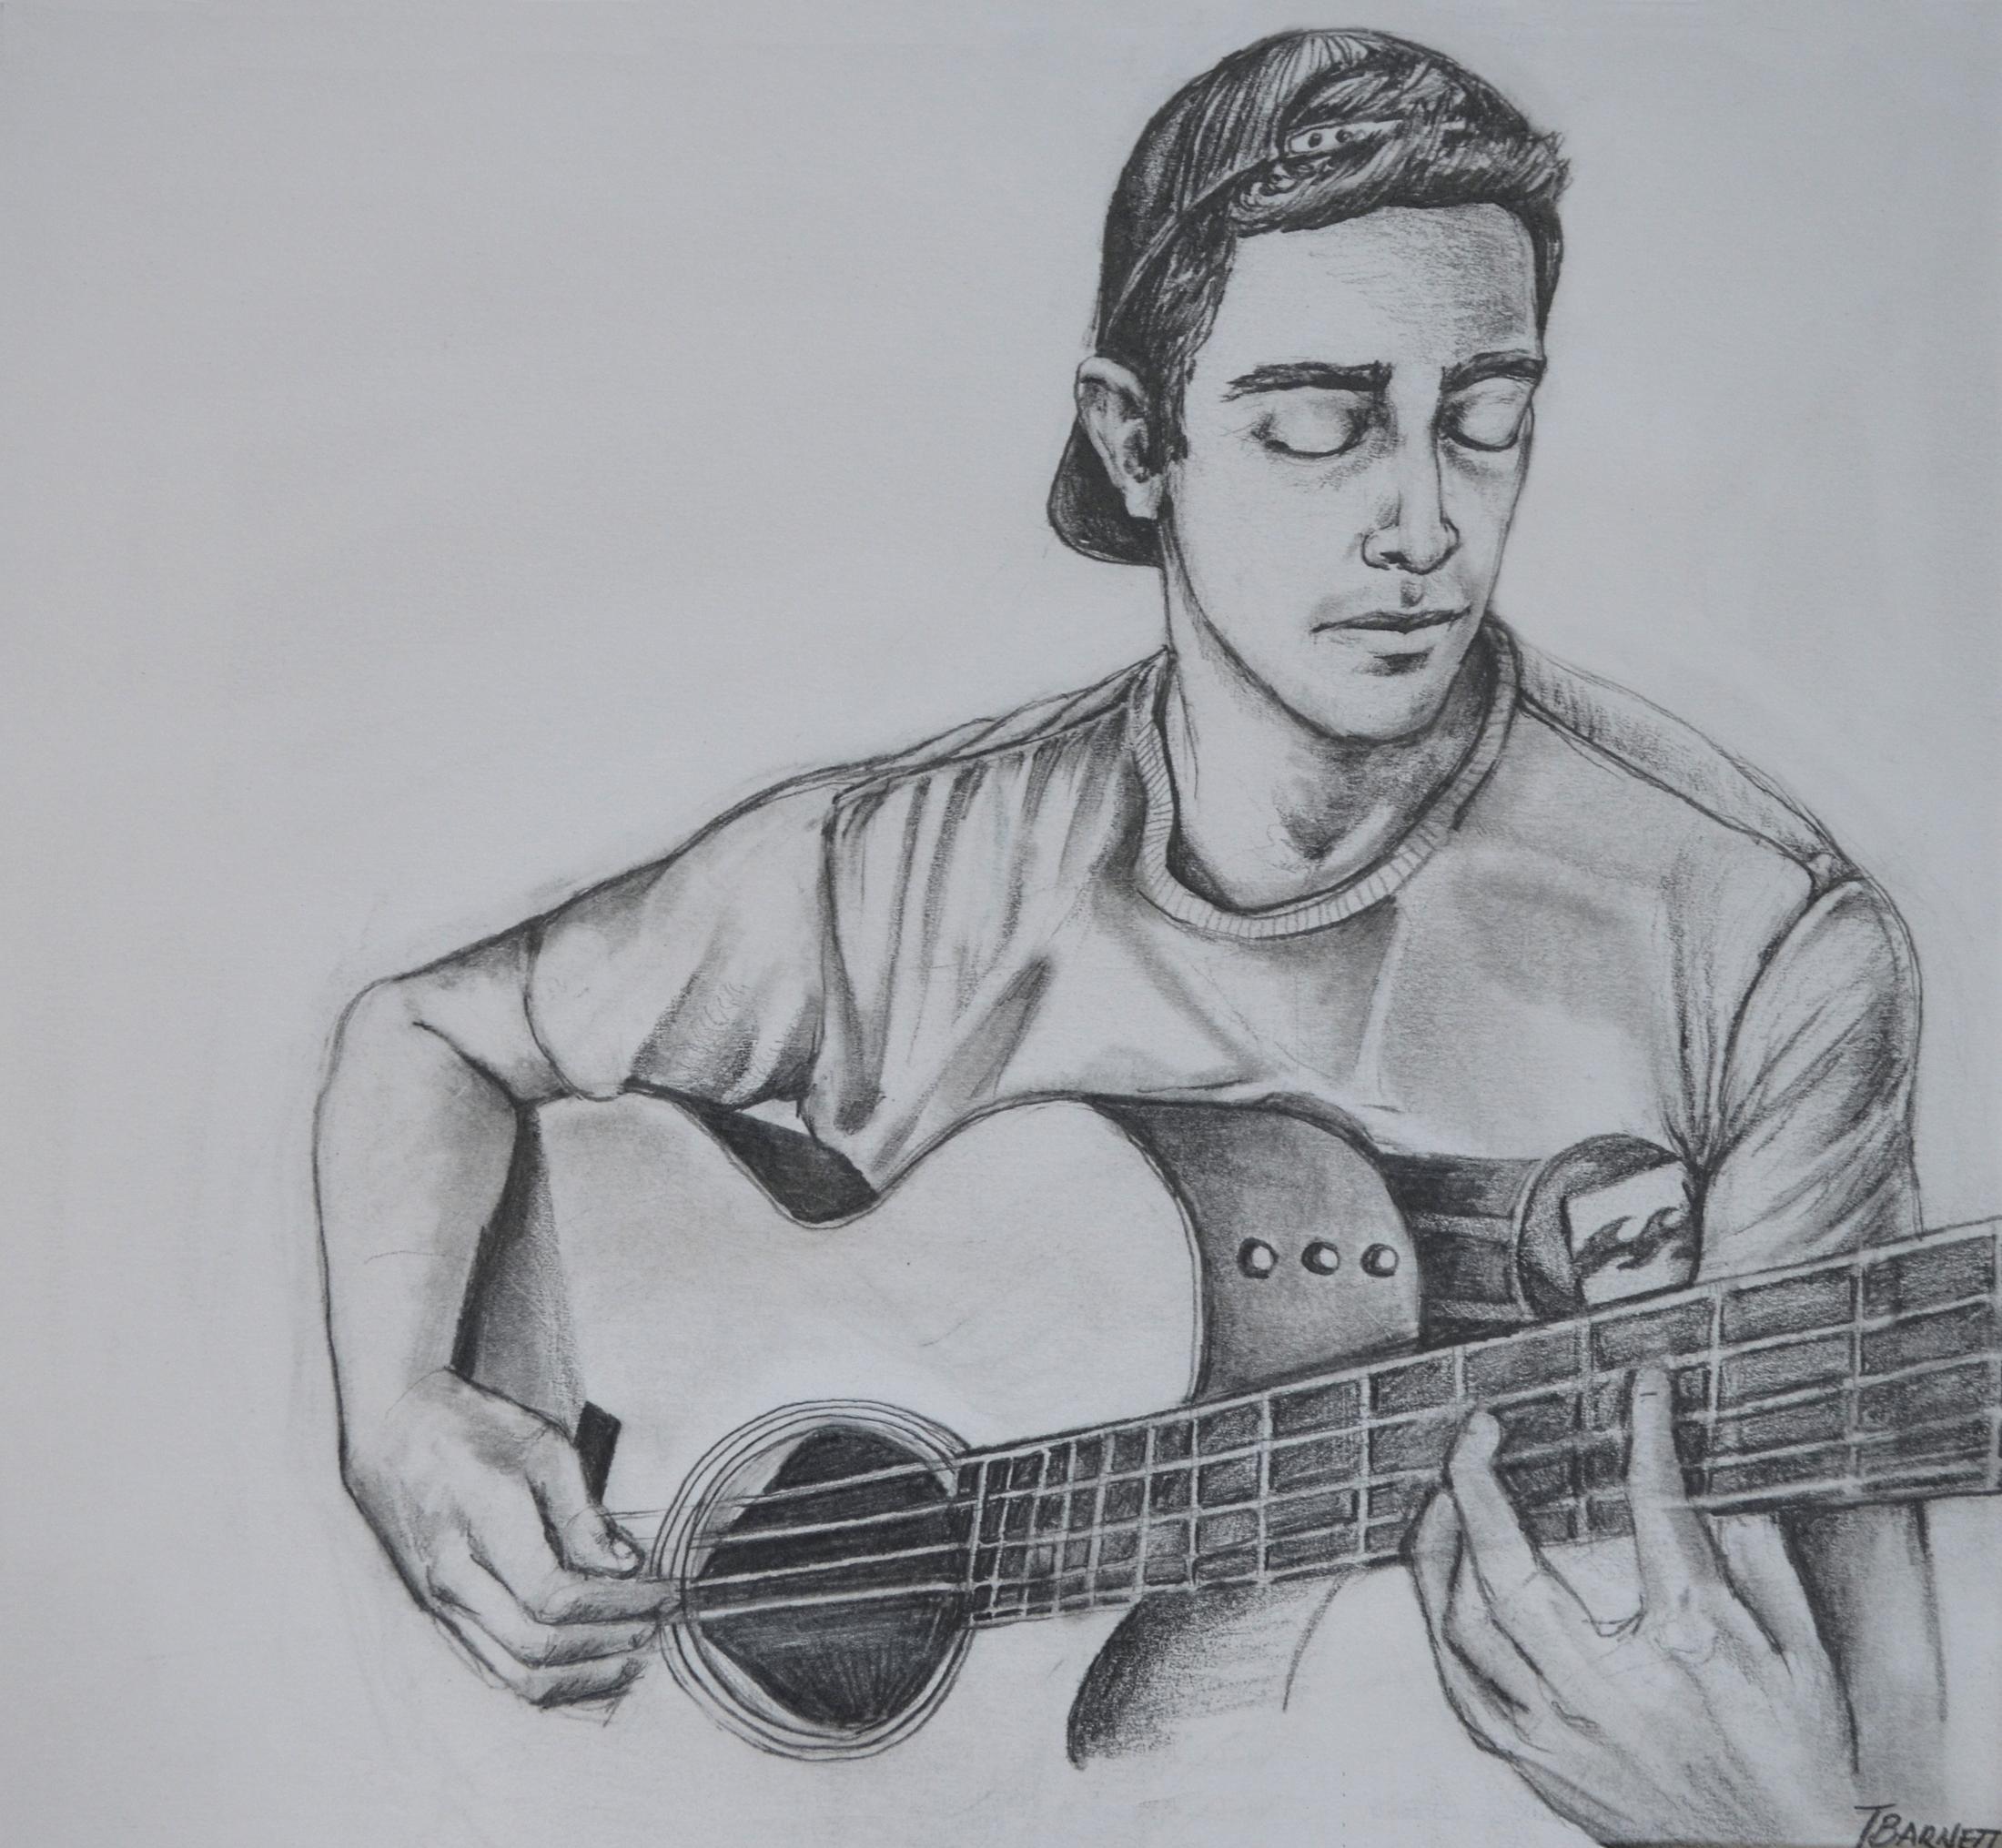 guitar-player-sketch